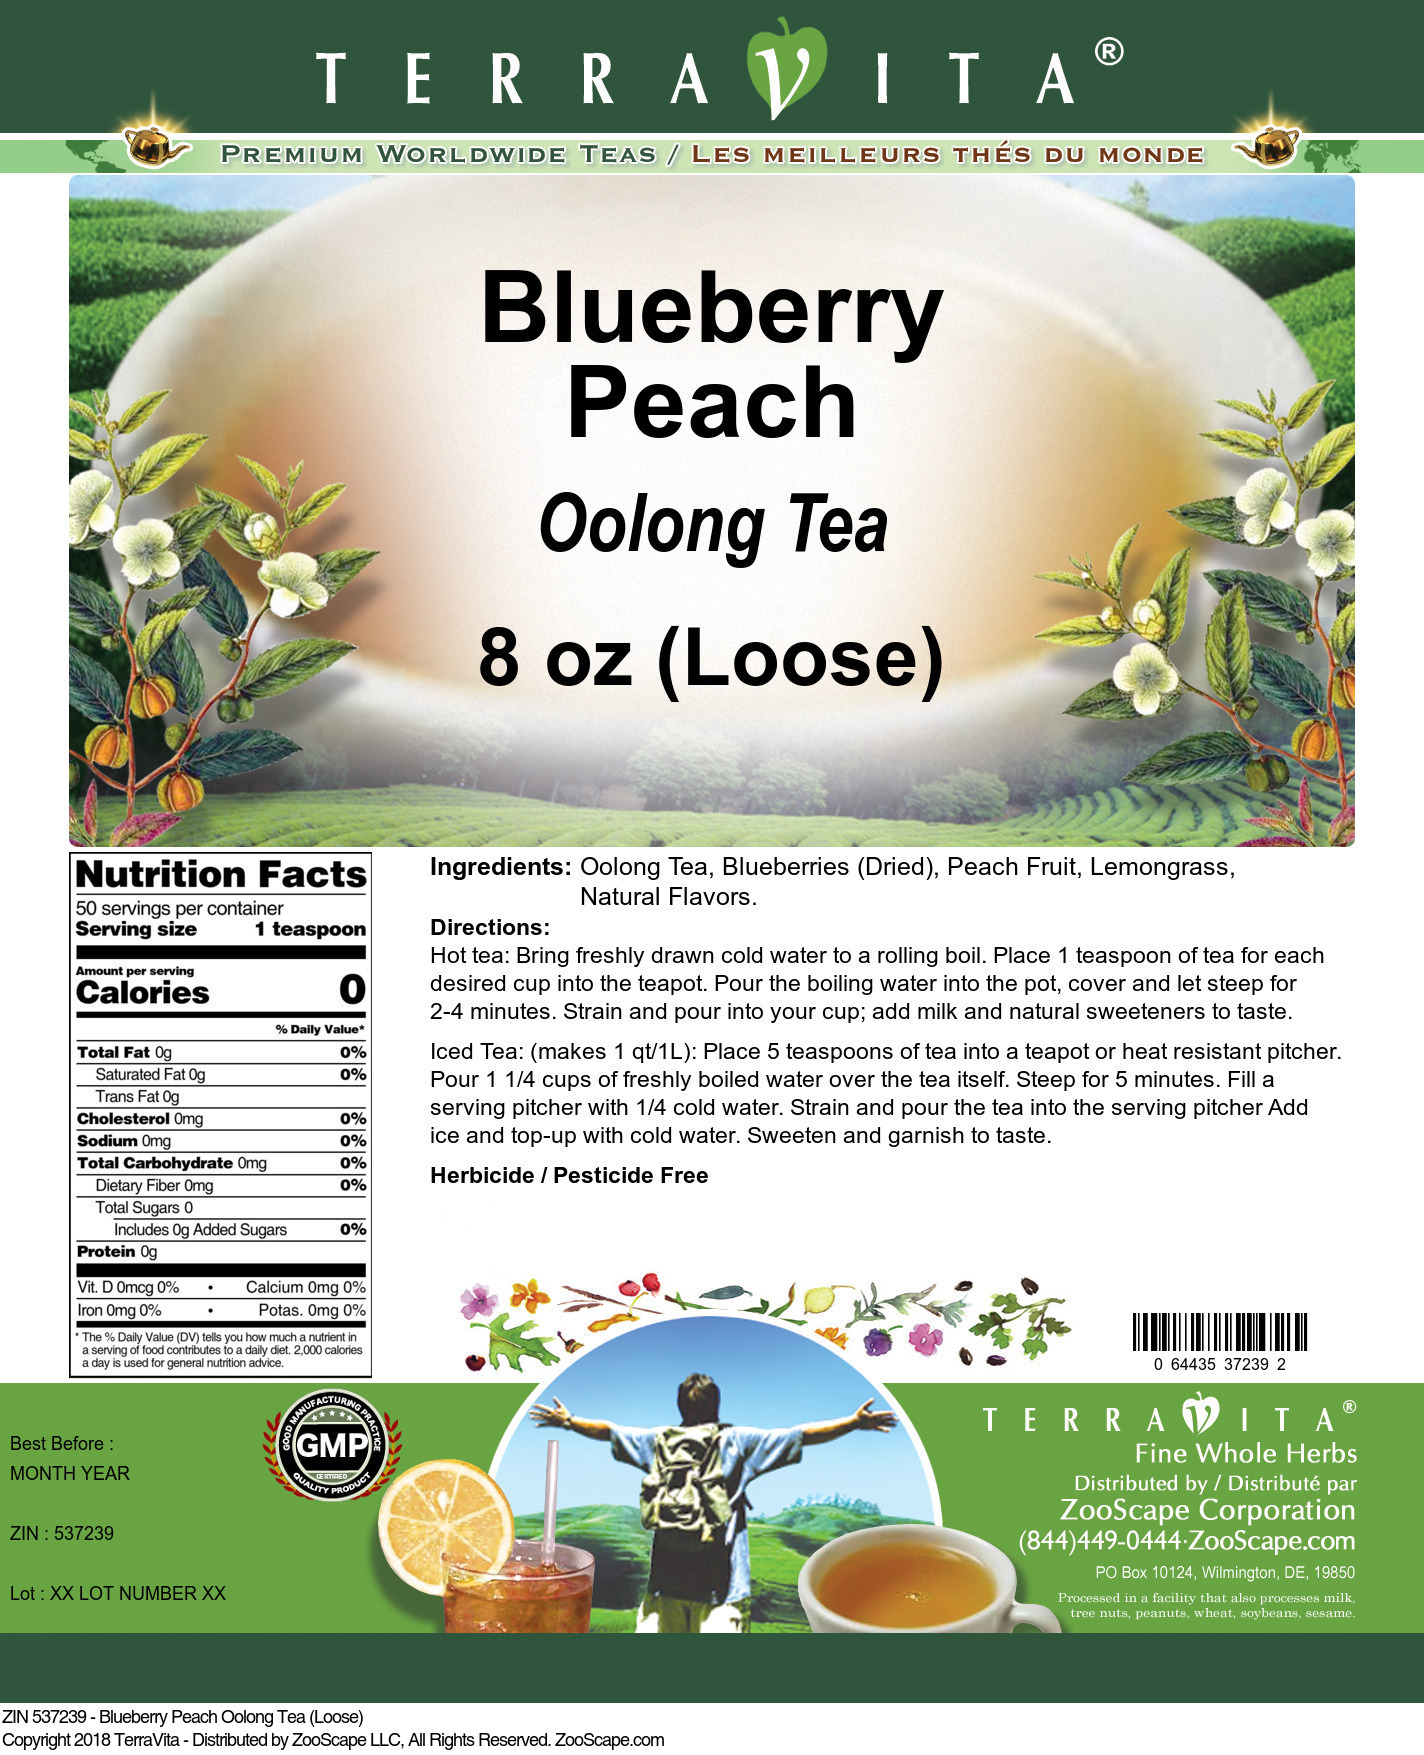 Blueberry Peach Oolong Tea (Loose)